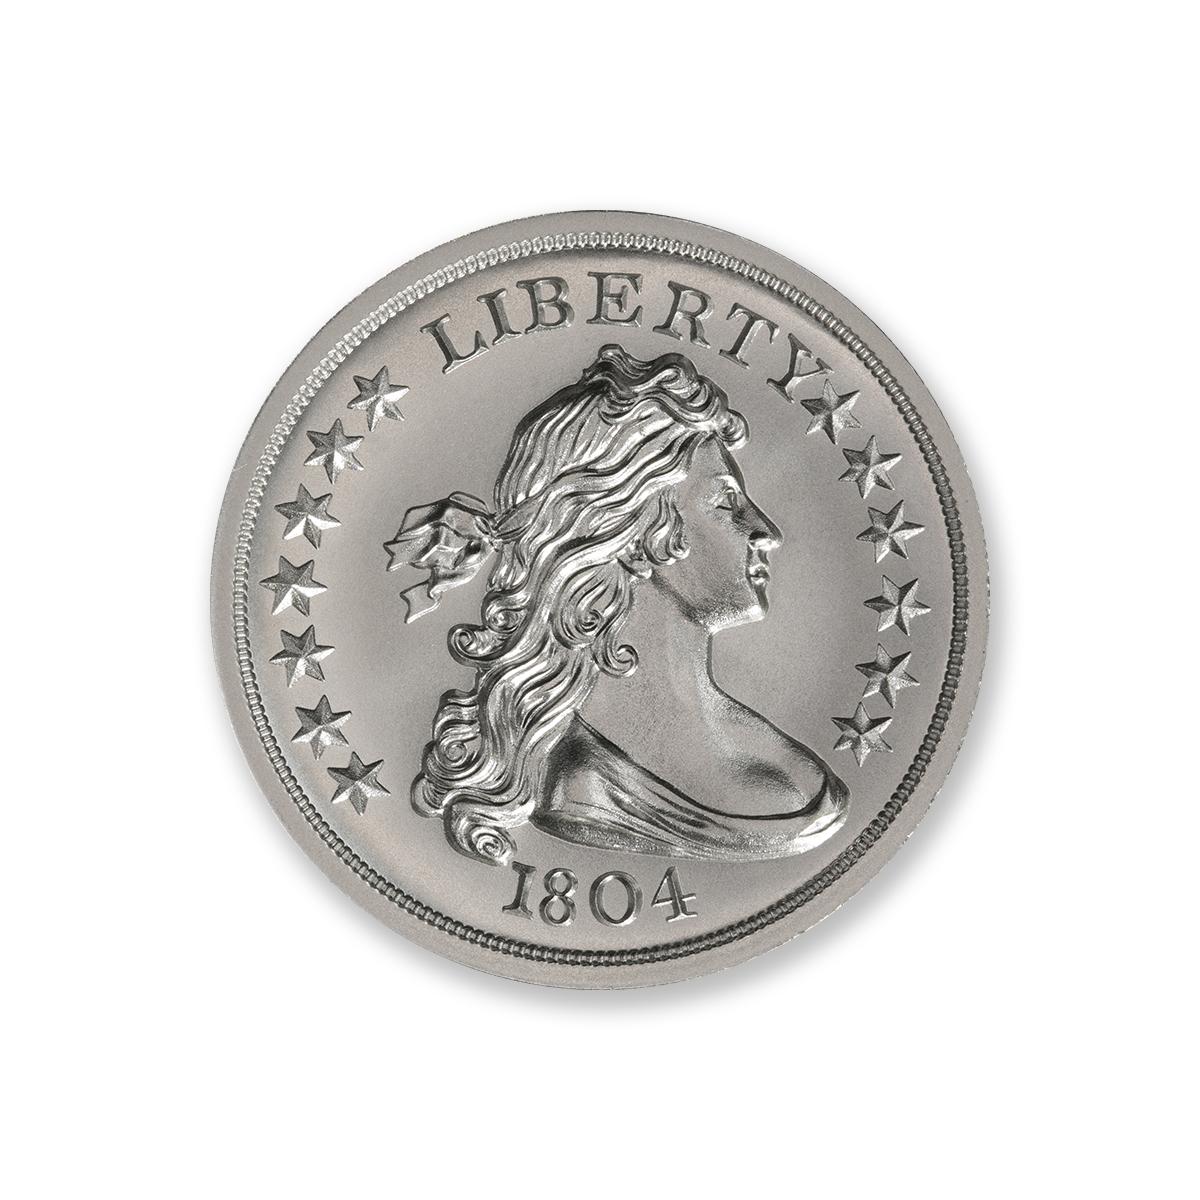 1804 DOLLAR TRIBUTE – 2 TROY OUNCE – 39MM